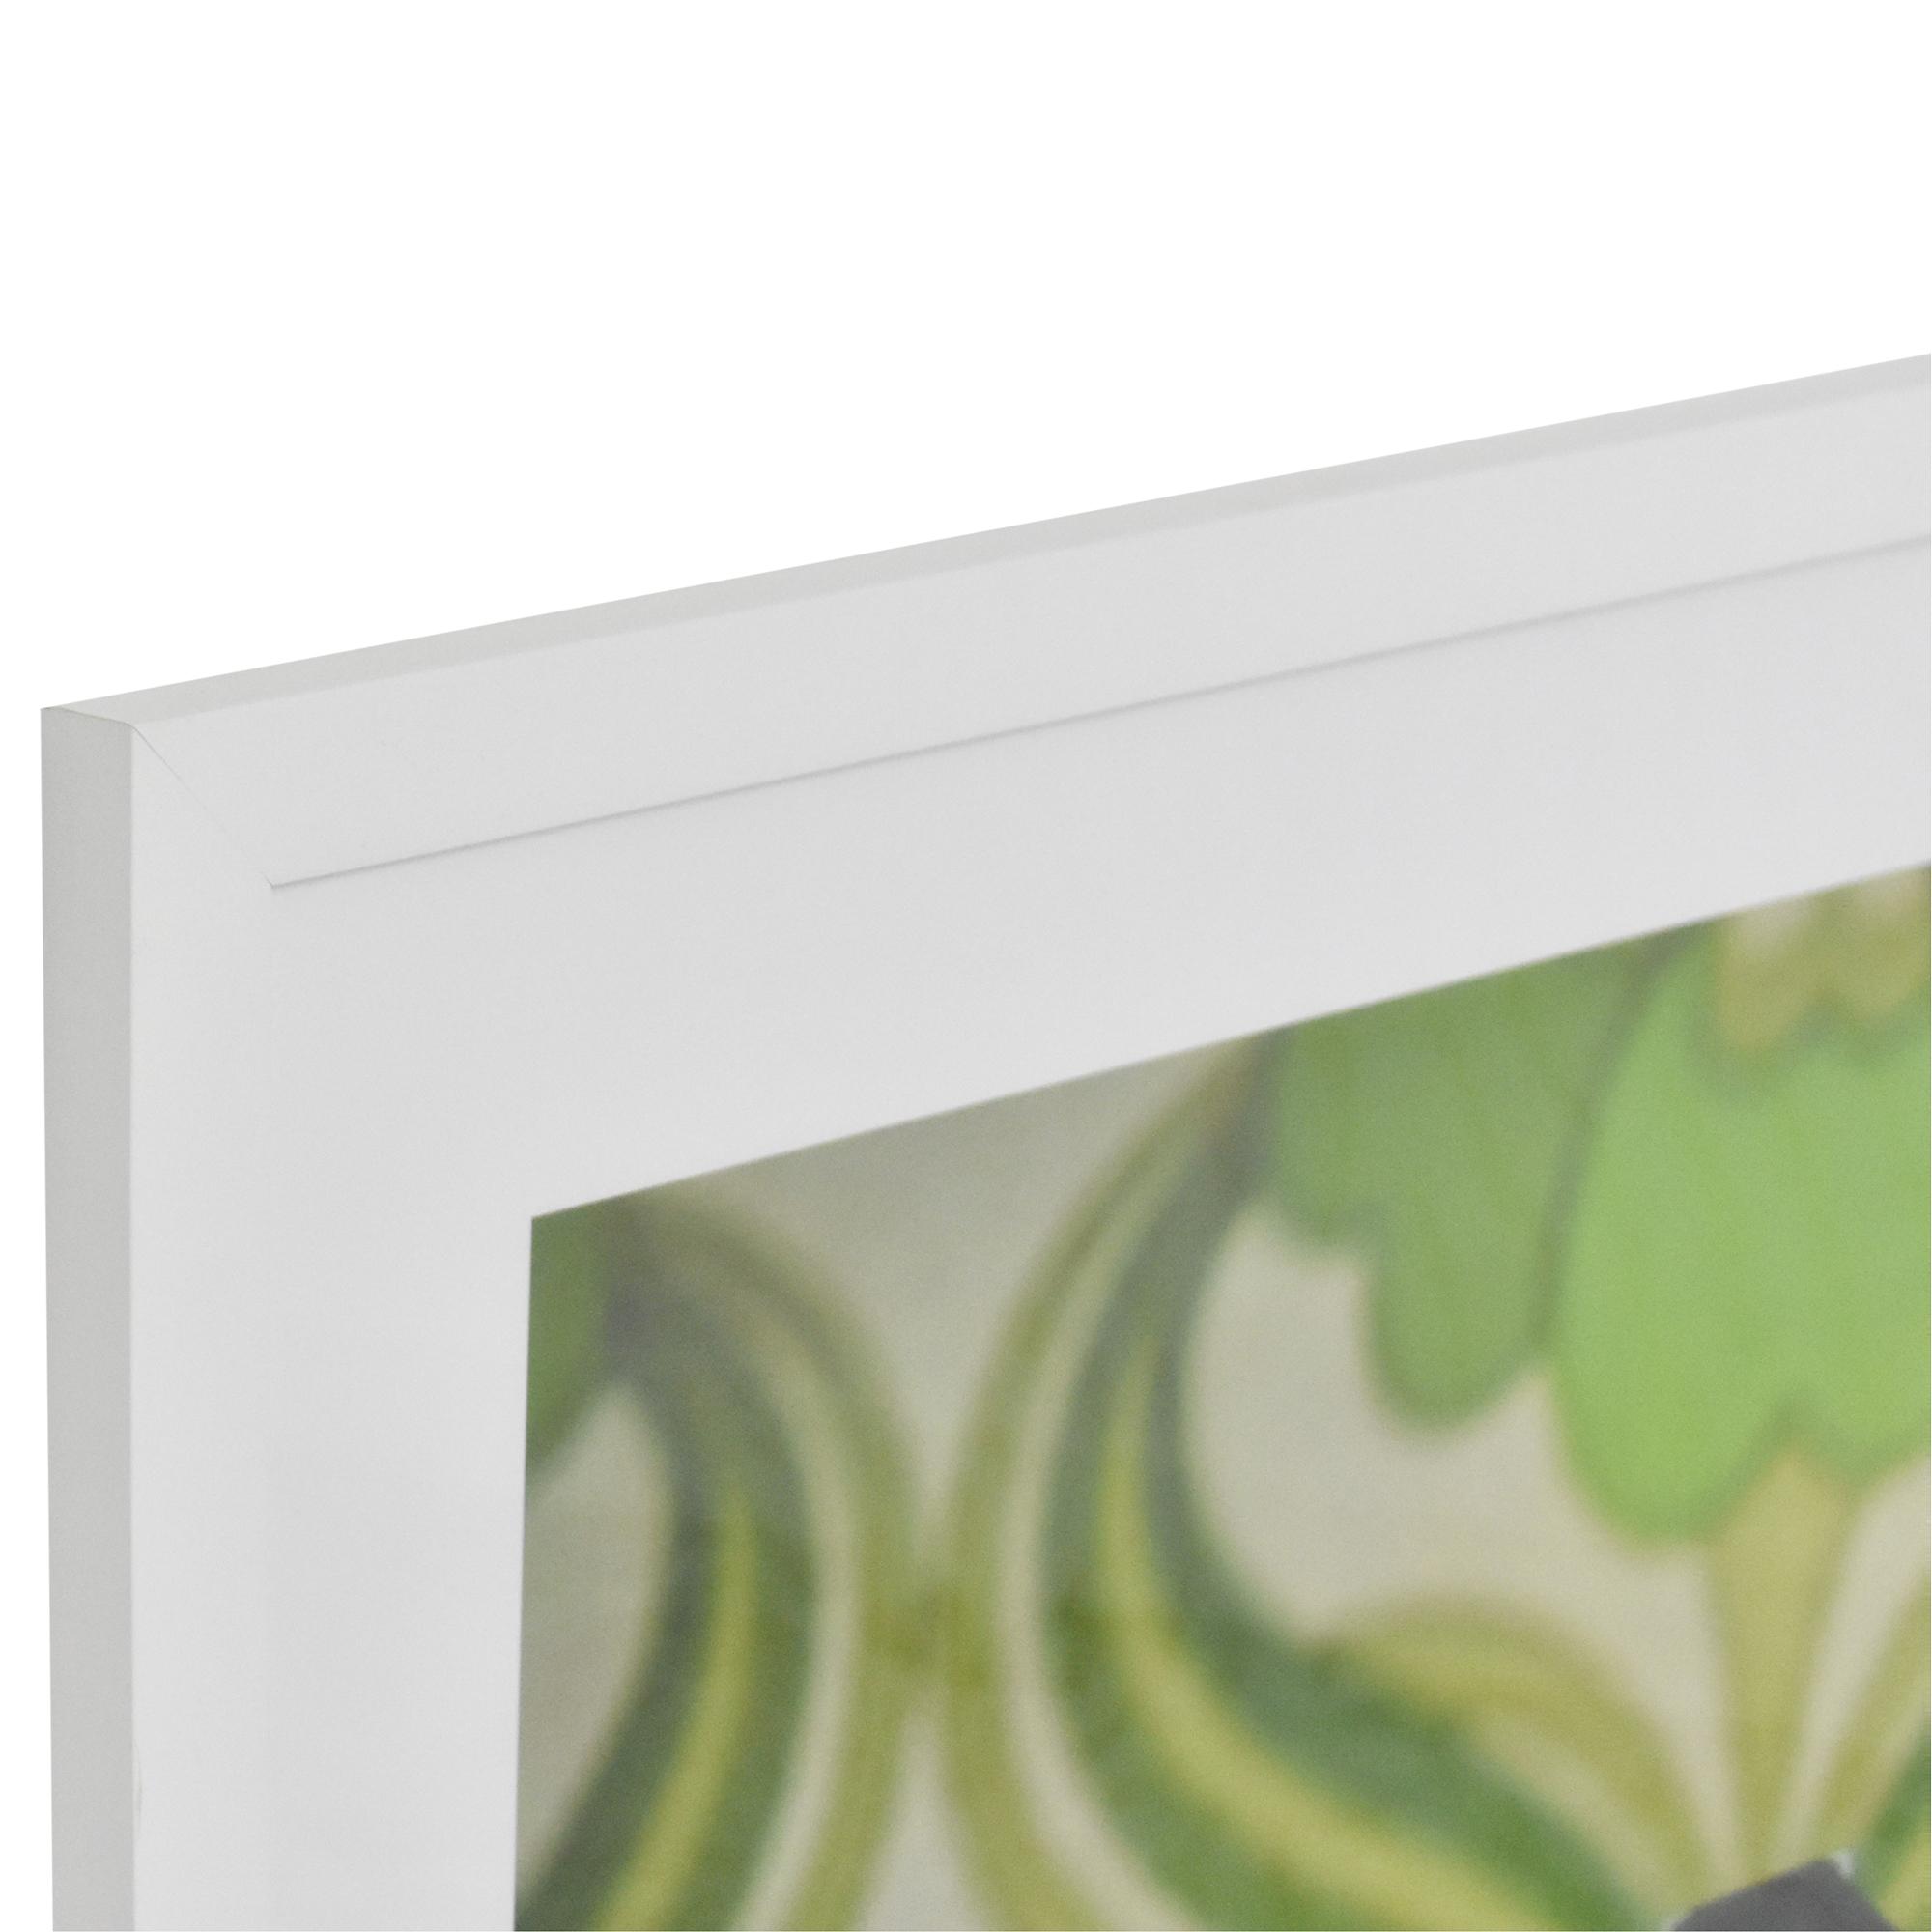 Flynn Newton CameraSelfie #36 Framed Wall Art discount